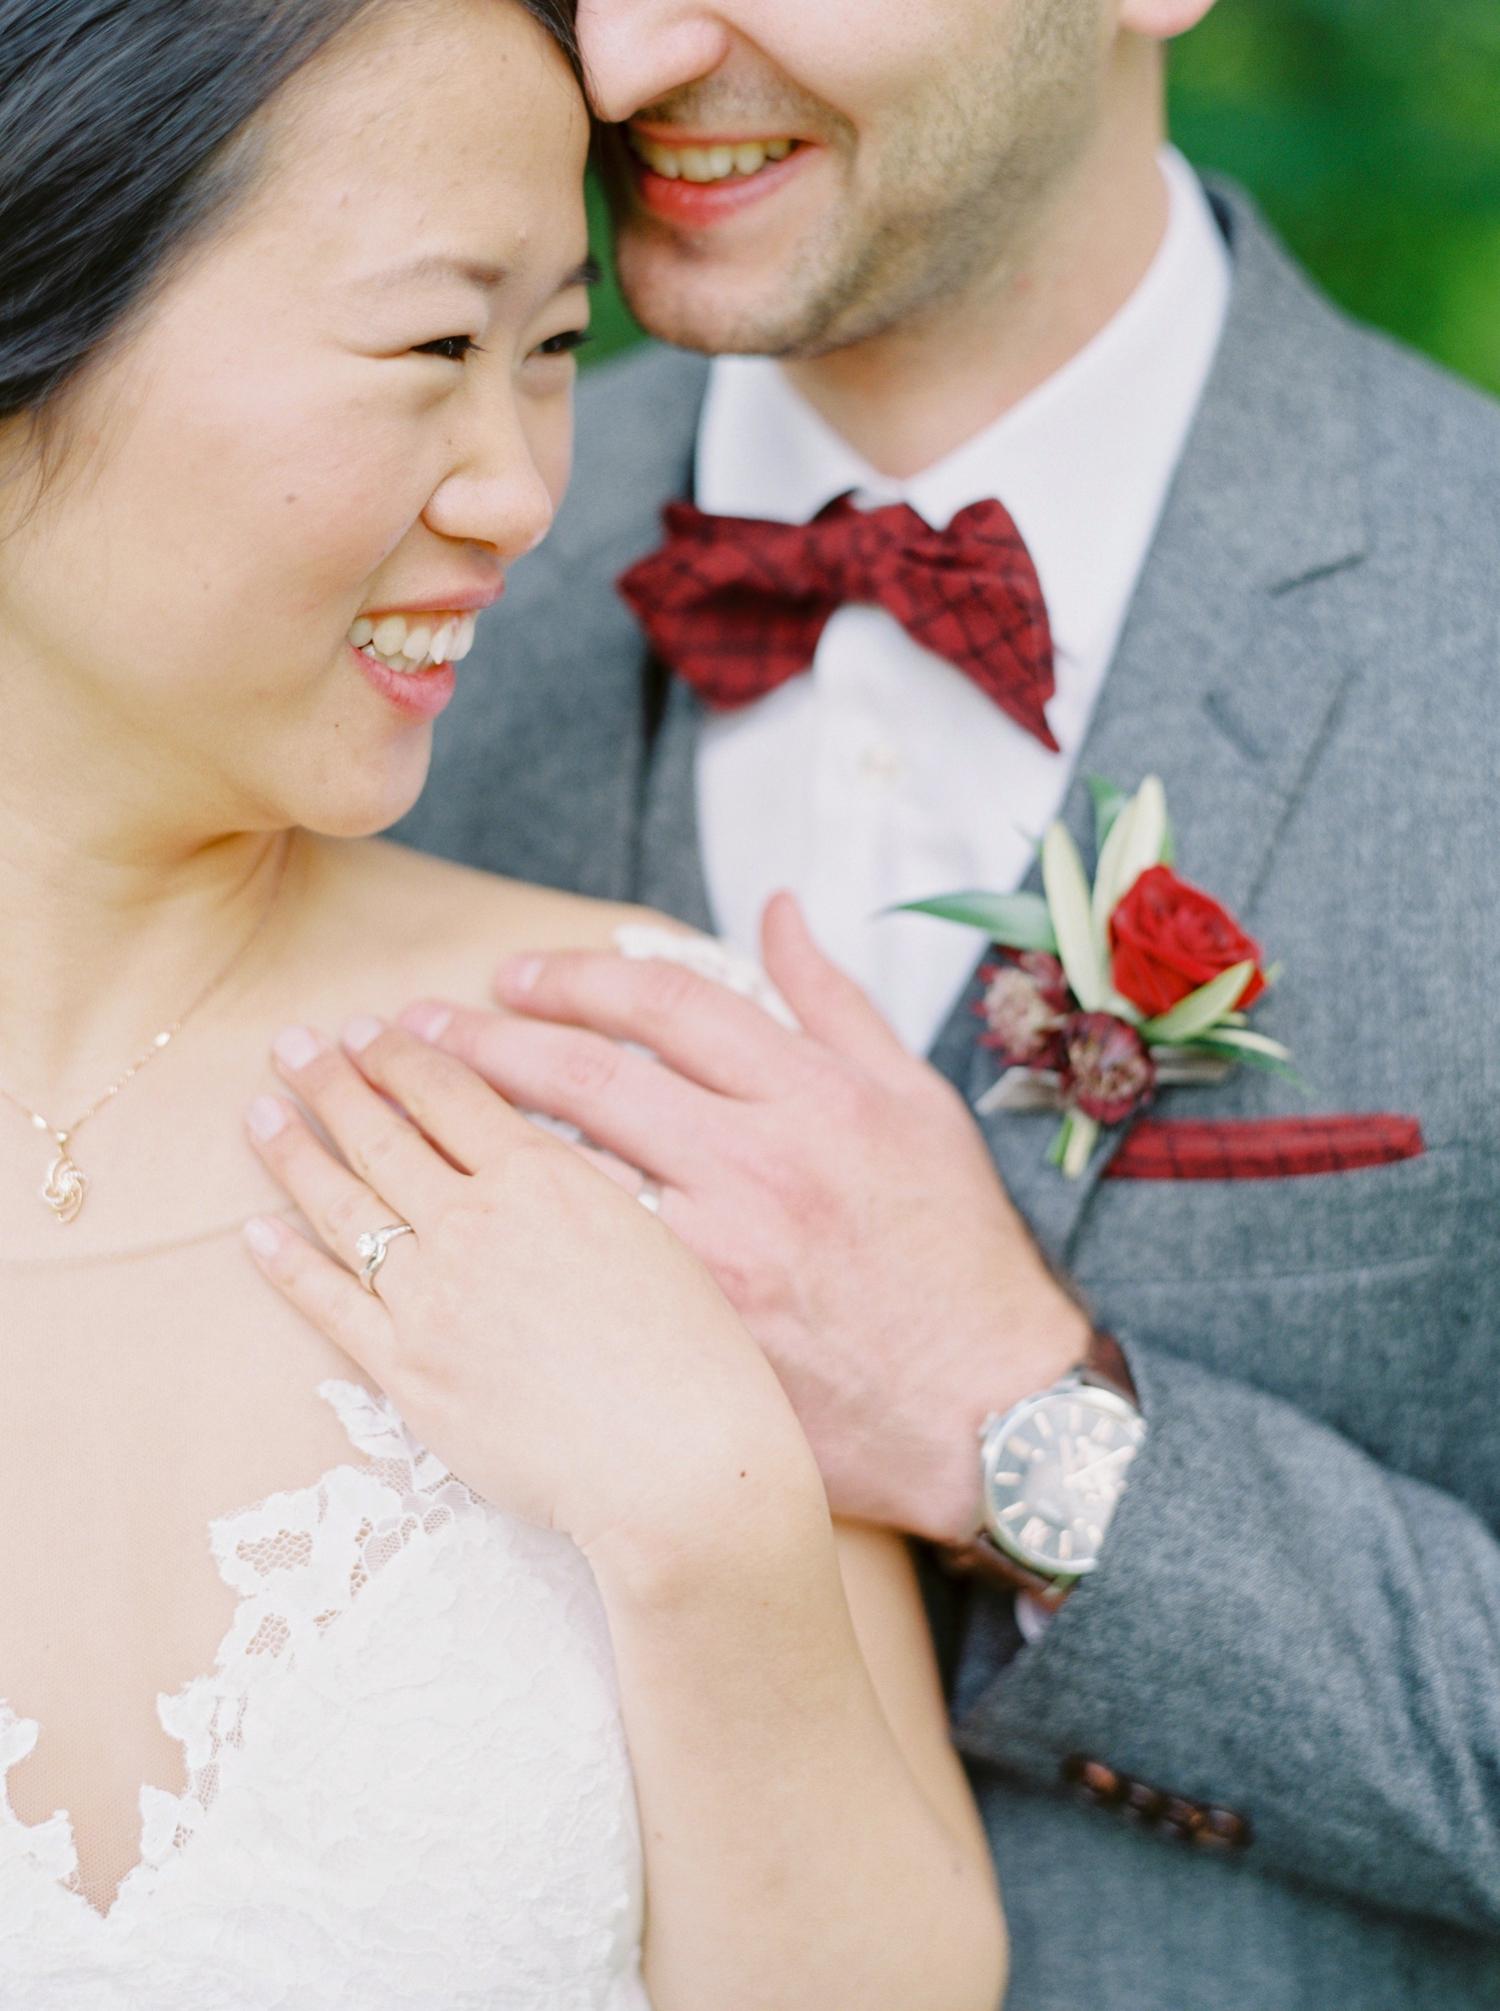 Calgary wedding photographer | fine art film photography | Calgary Wedding Photographers | Calgary couples photographer | Justine Milton Photography | bowtie | couples portrait